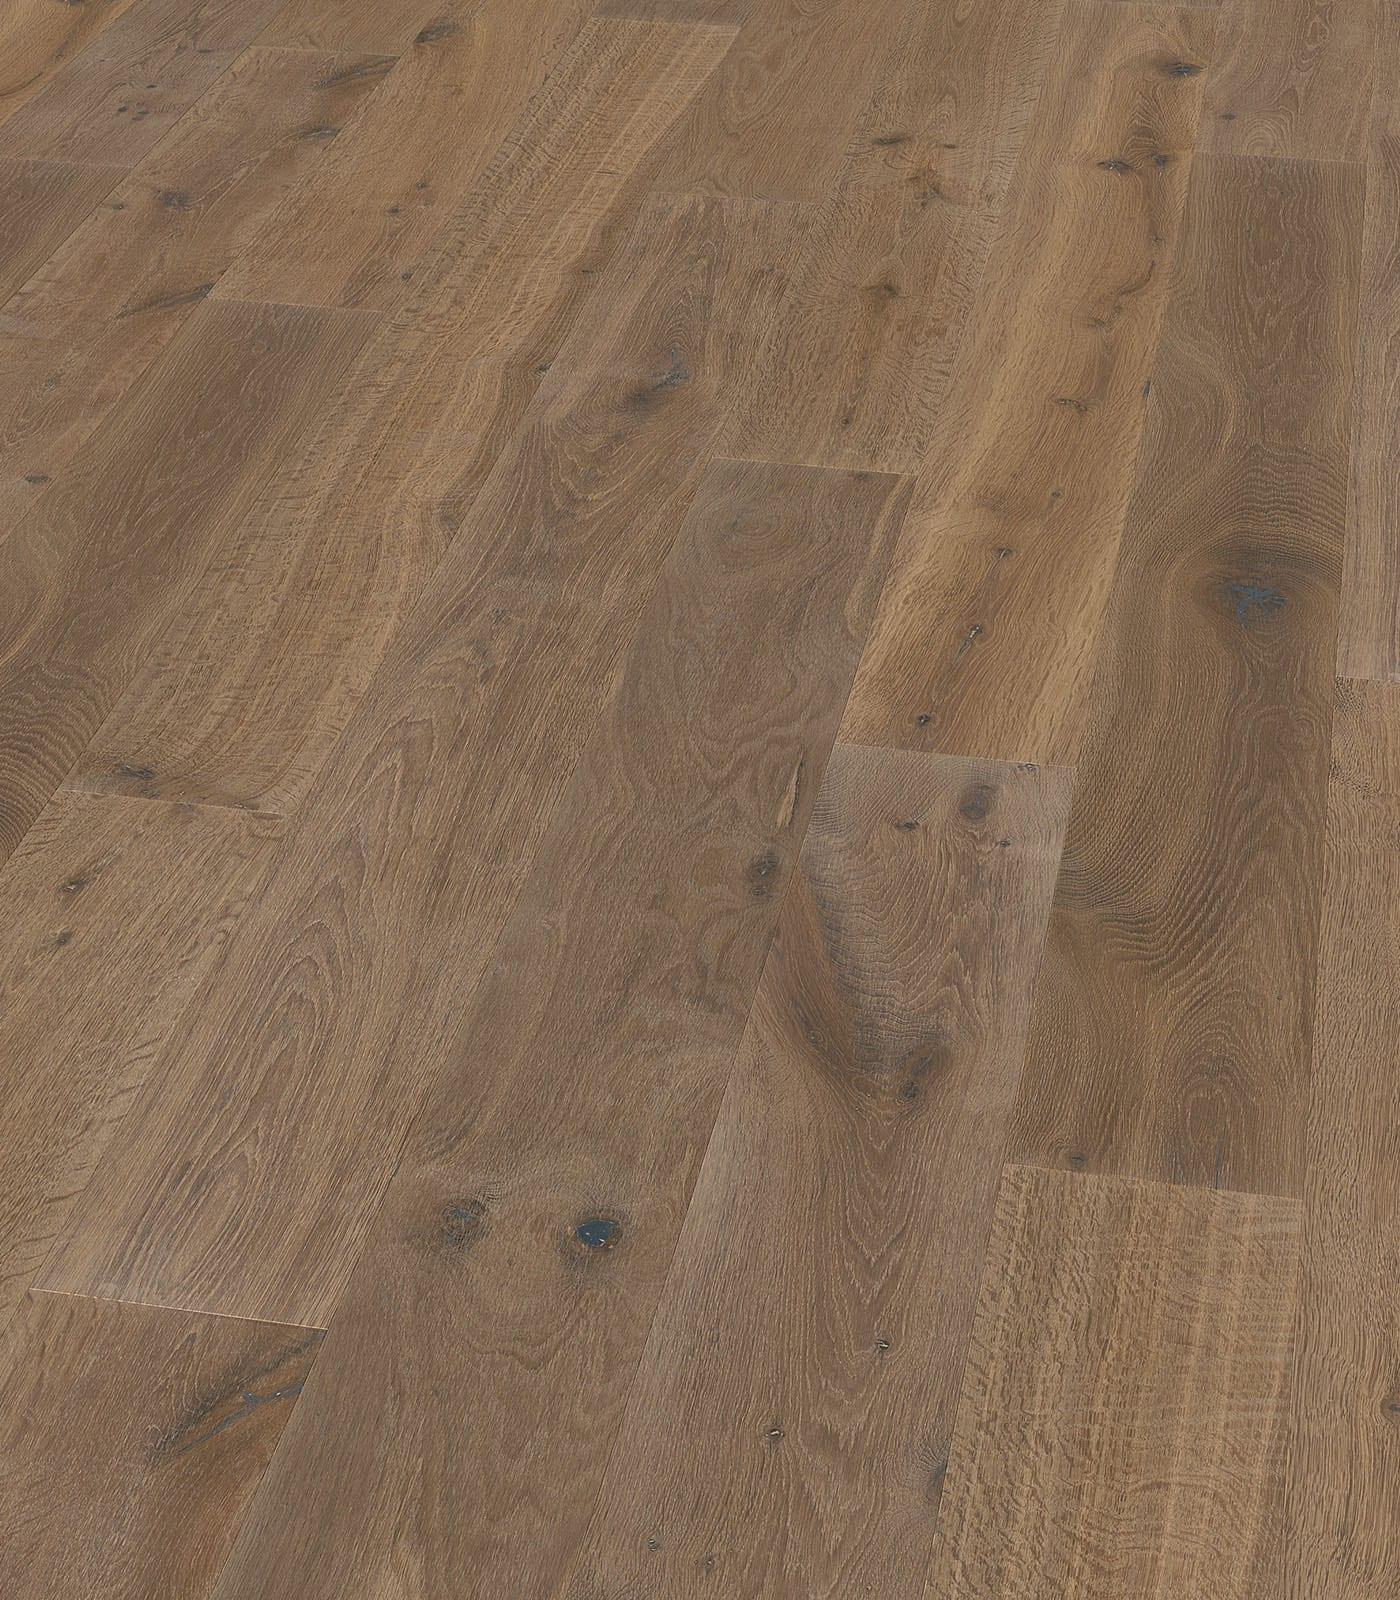 Anguilla-Lifestyle Collection-European Oak Floors-angle